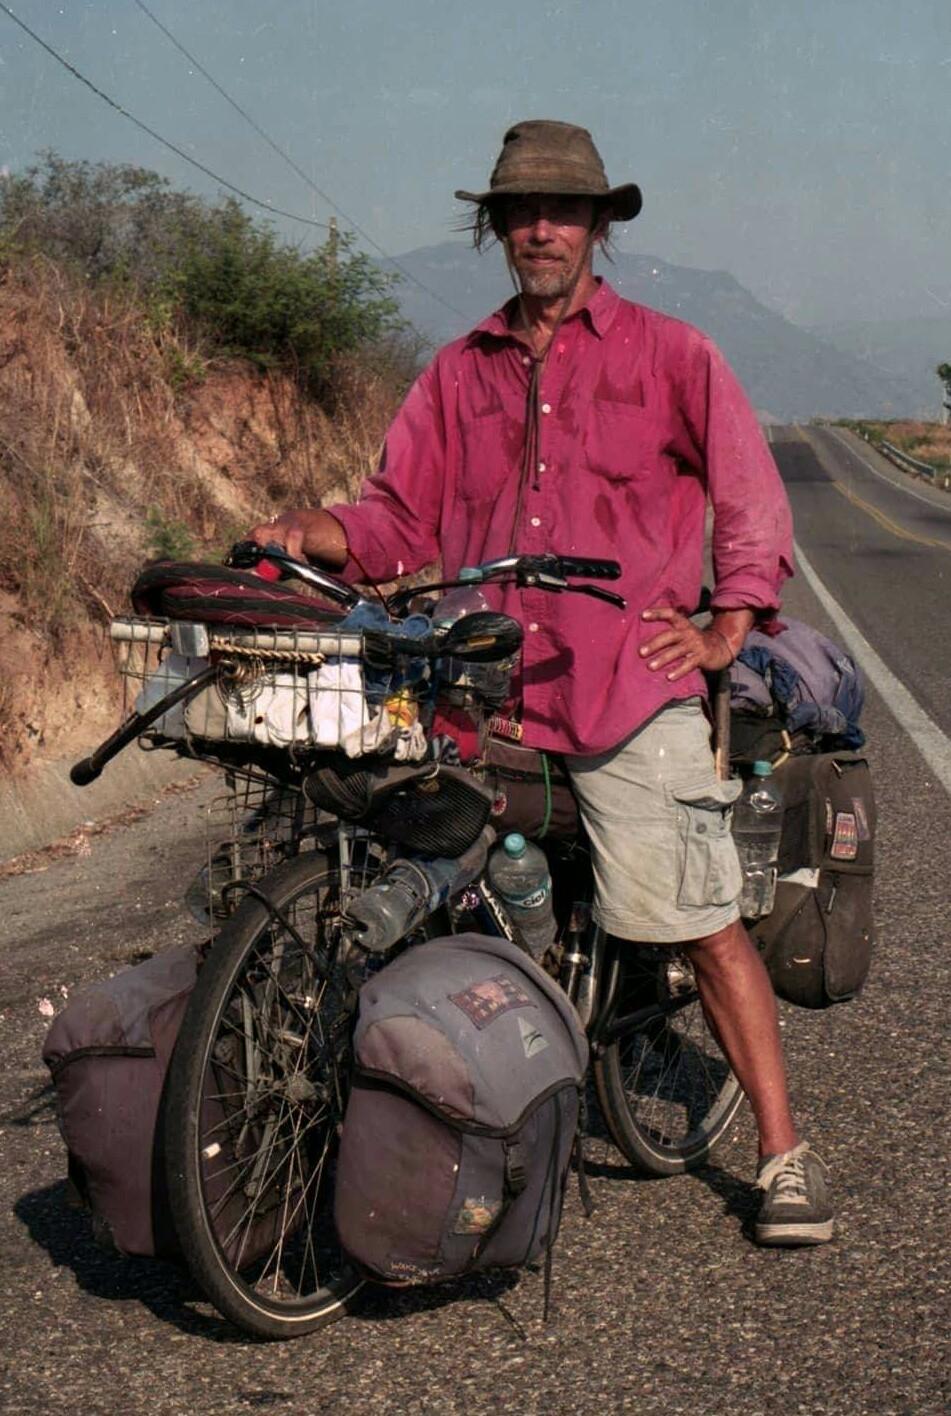 Mexico riding thousand miles De - pcflvly   ello